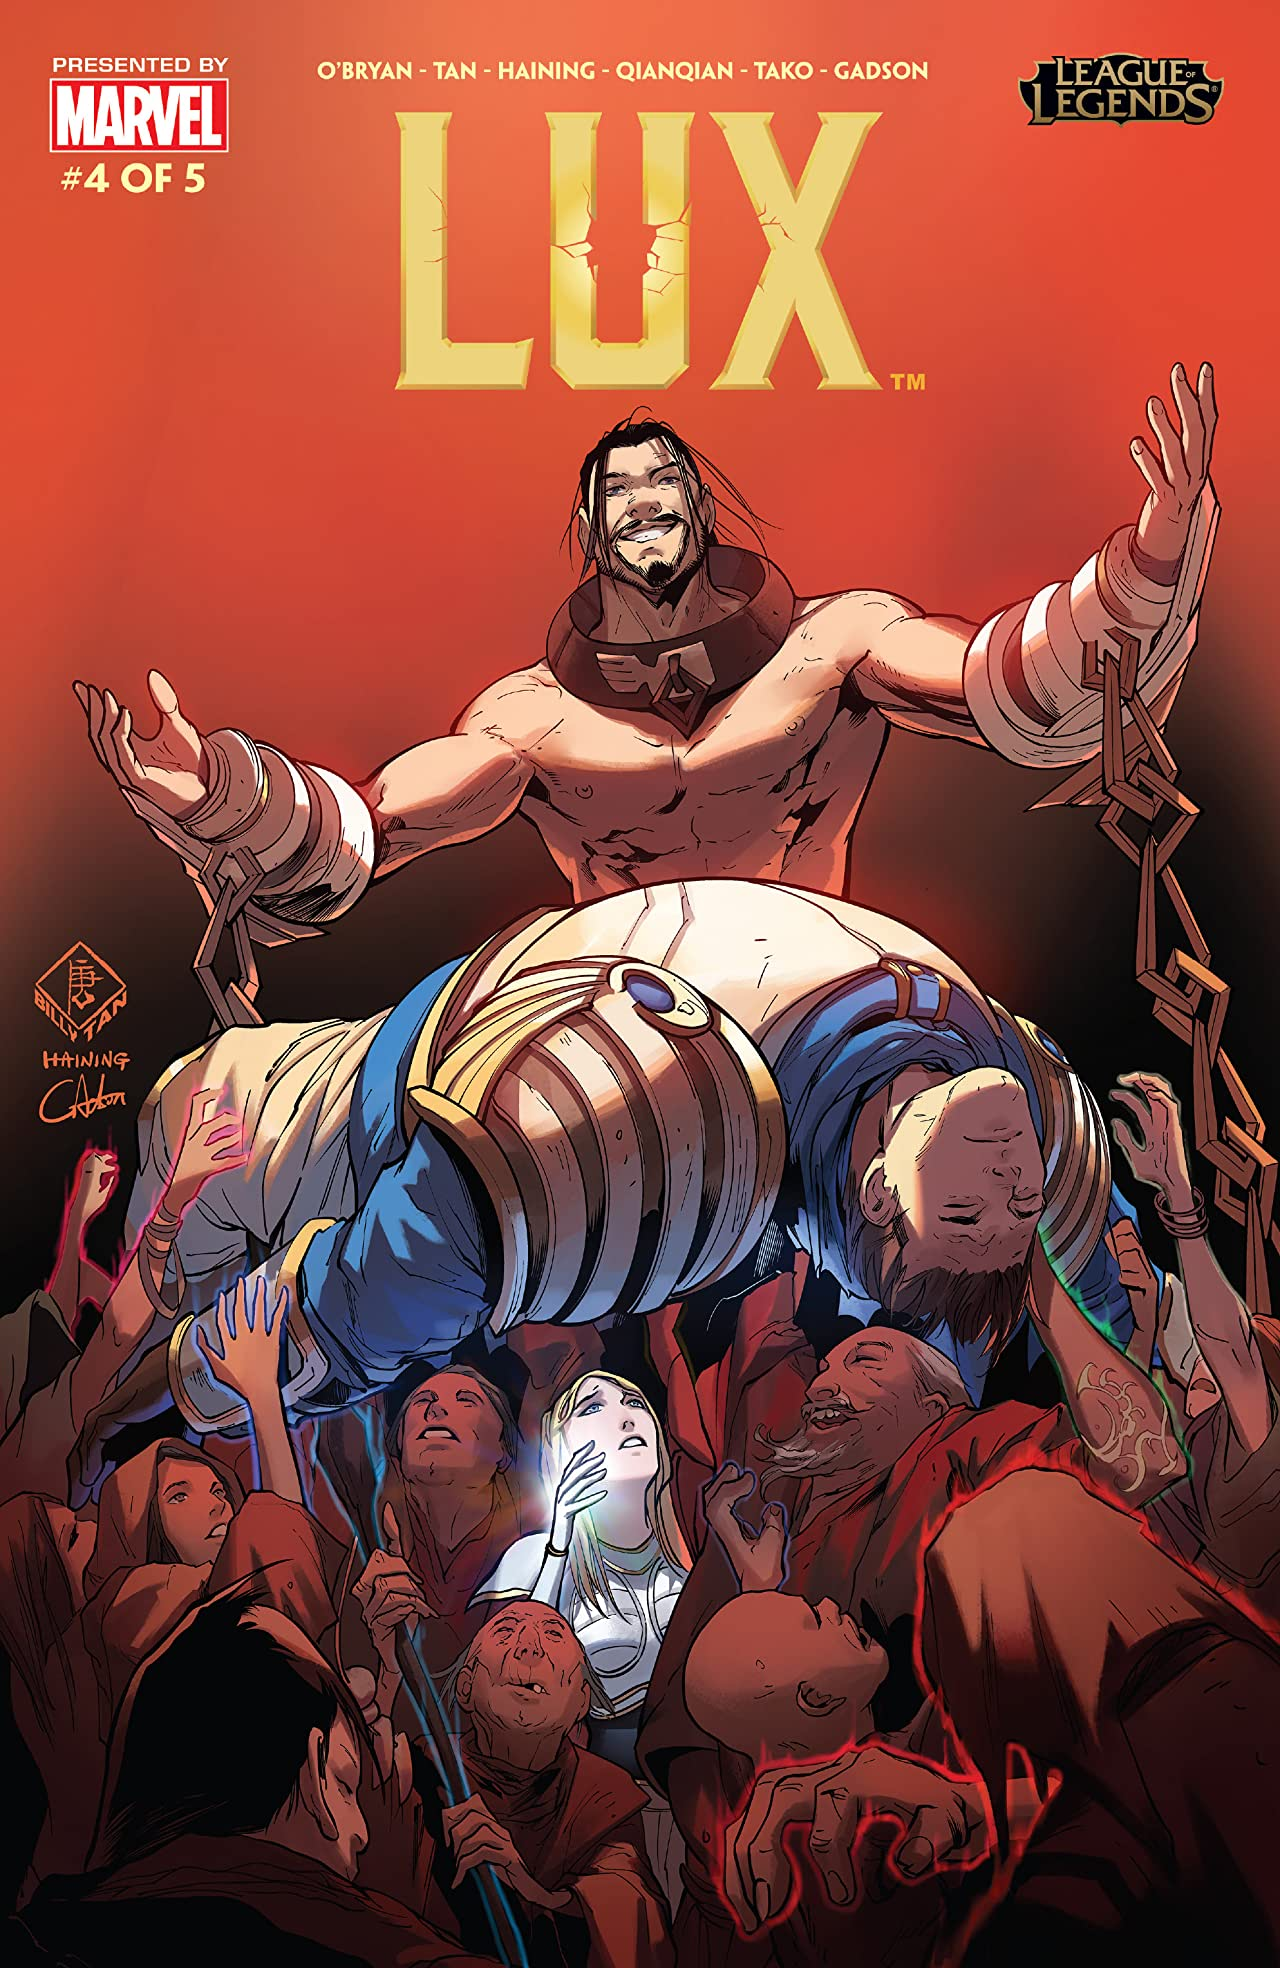 League Of Legends: Lux #4 (of 5)